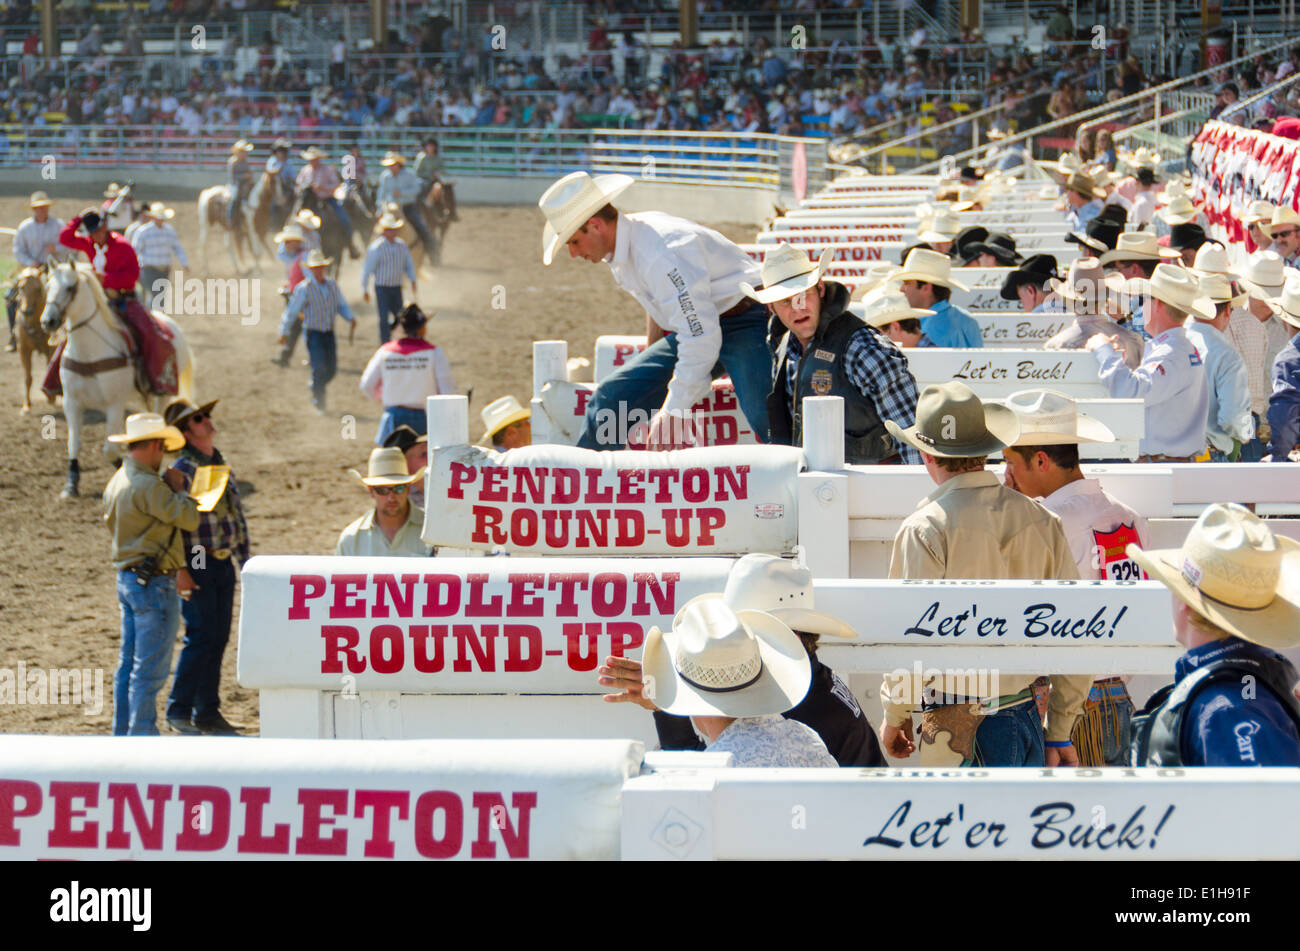 Cowboys Pendleton Roundup - Stock Image